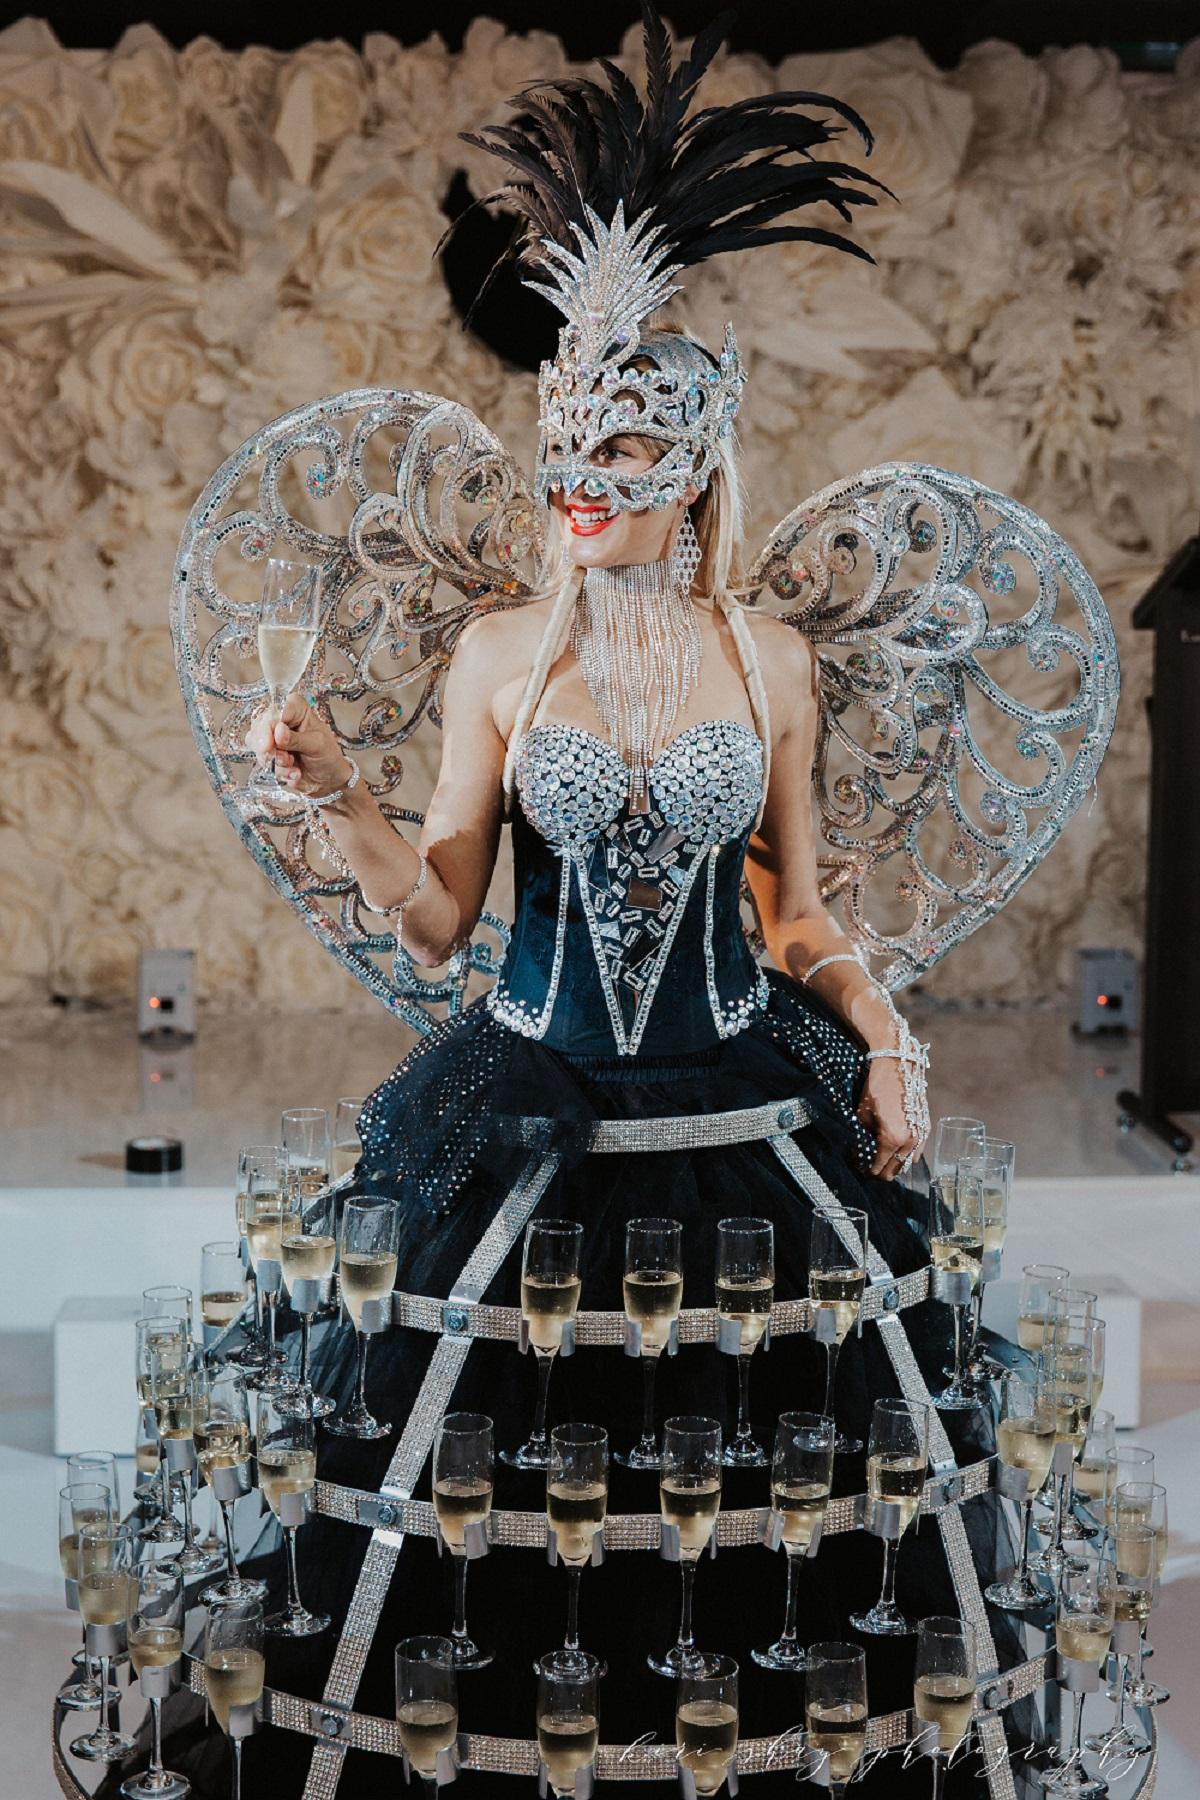 luxury_champagne_service.jpg